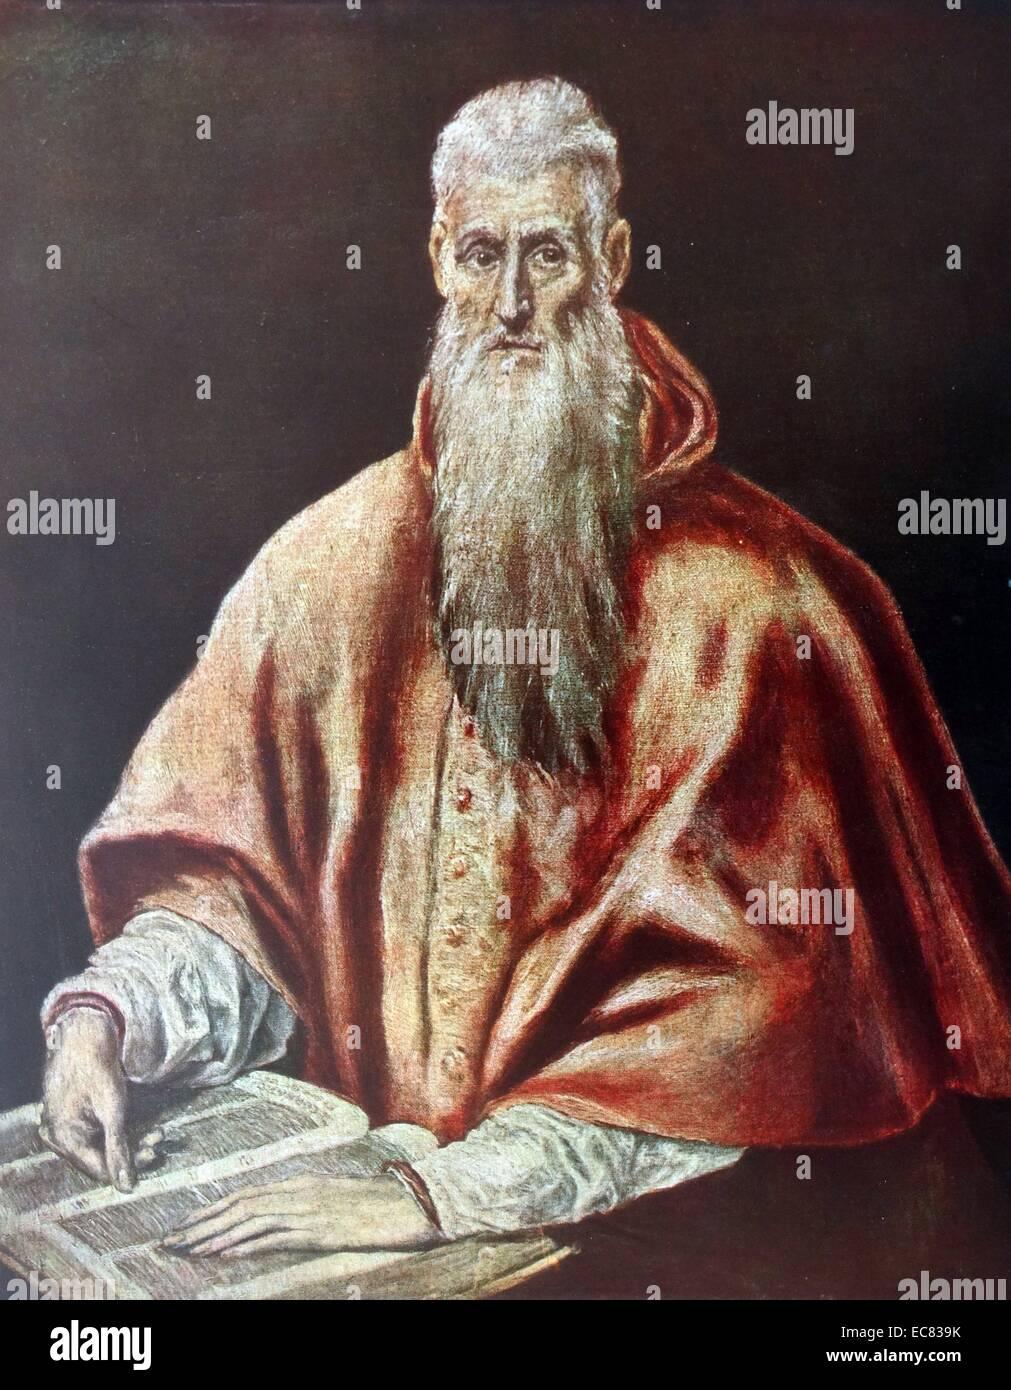 Portrait of Saint Jerome - Stock Image